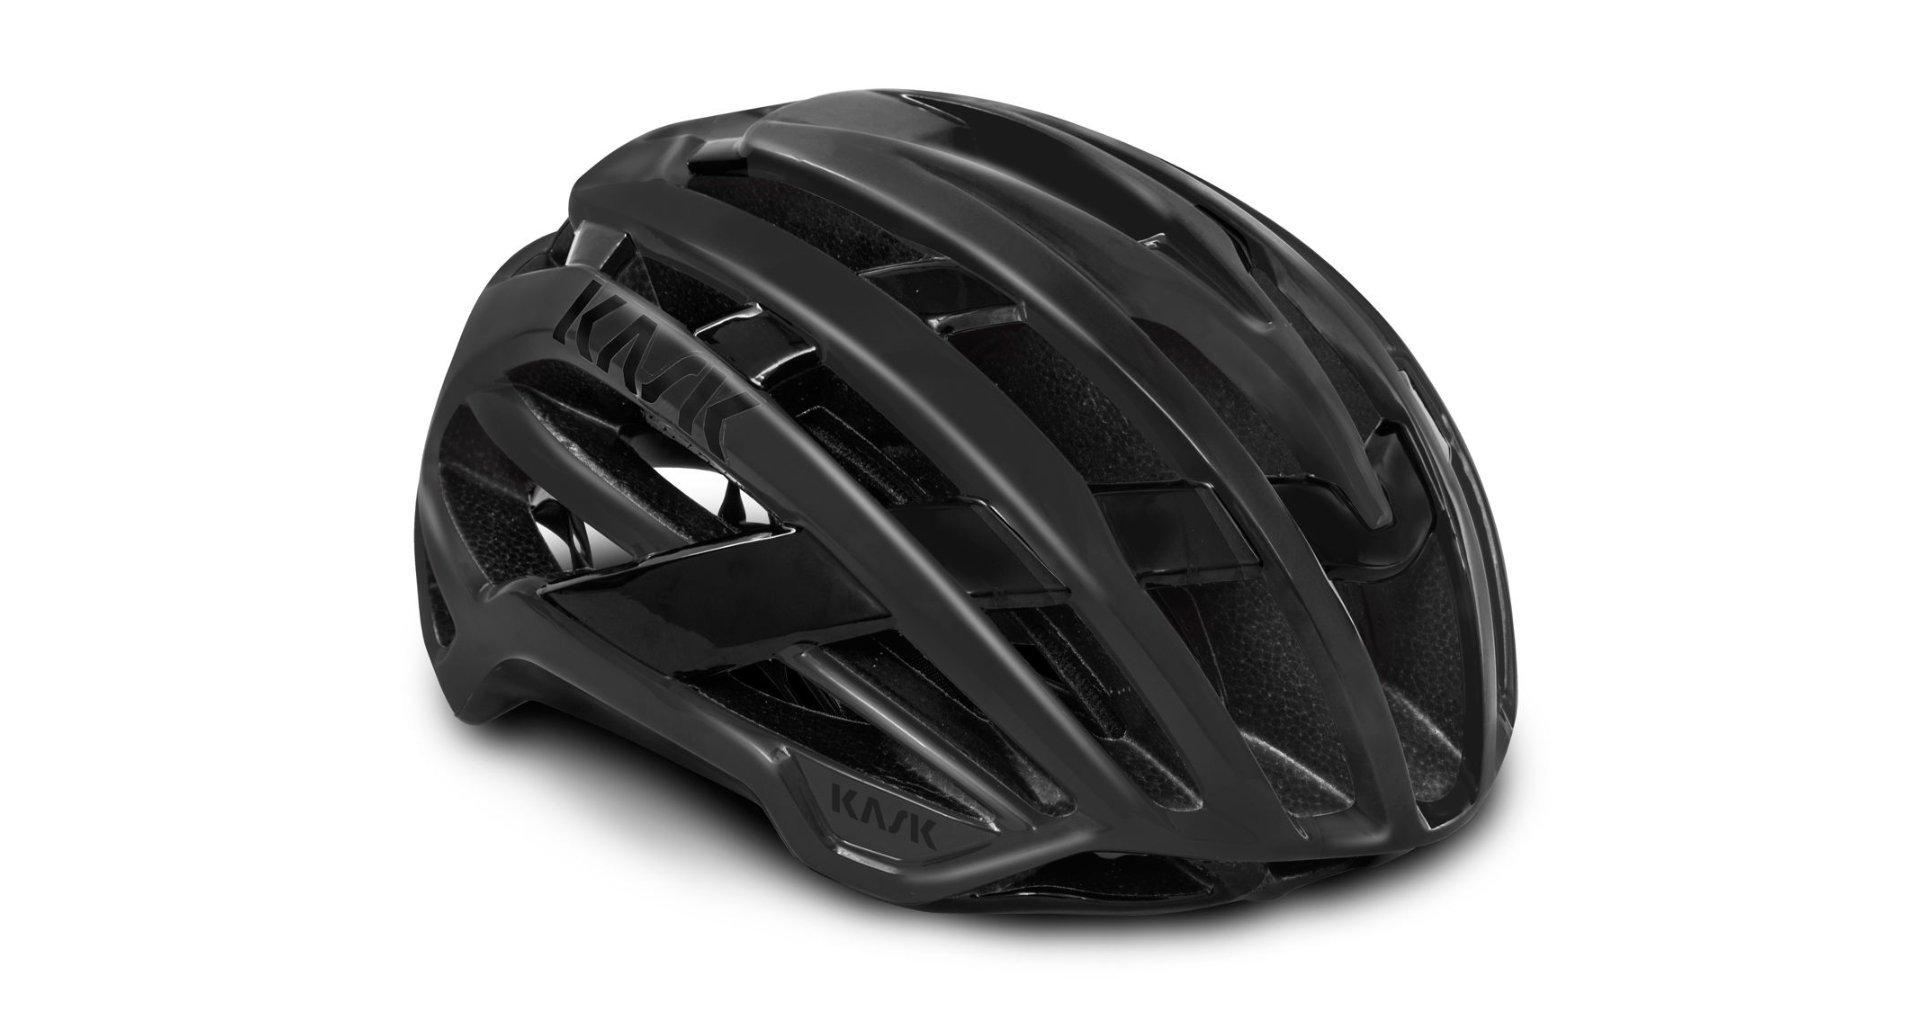 Kask Valegro Helmet, Small, Black Matte